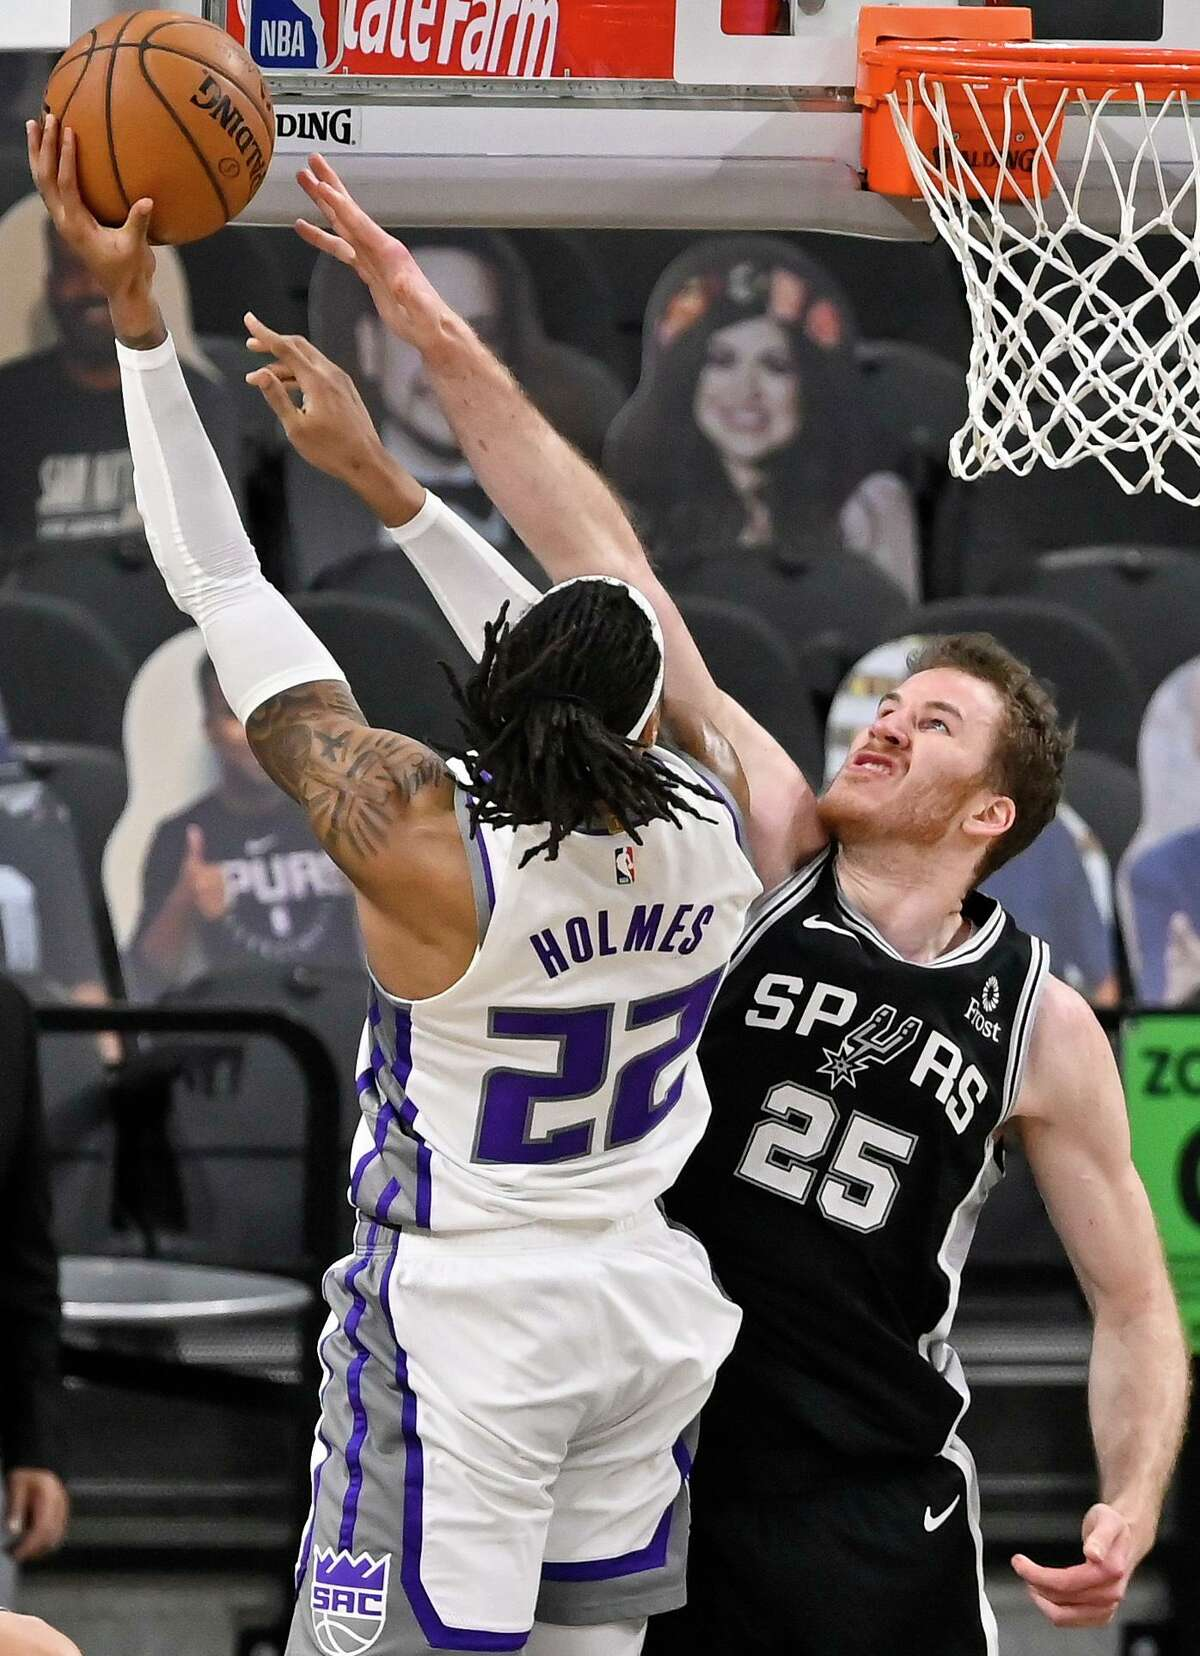 Sacramento Kings' Richaun Holmes (22) shoots against San Antonio Spurs' Jakob Poeltl during the first half of an NBA basketball game, Wednesday, March 31, 2021, in San Antonio. (AP Photo/Darren Abate)